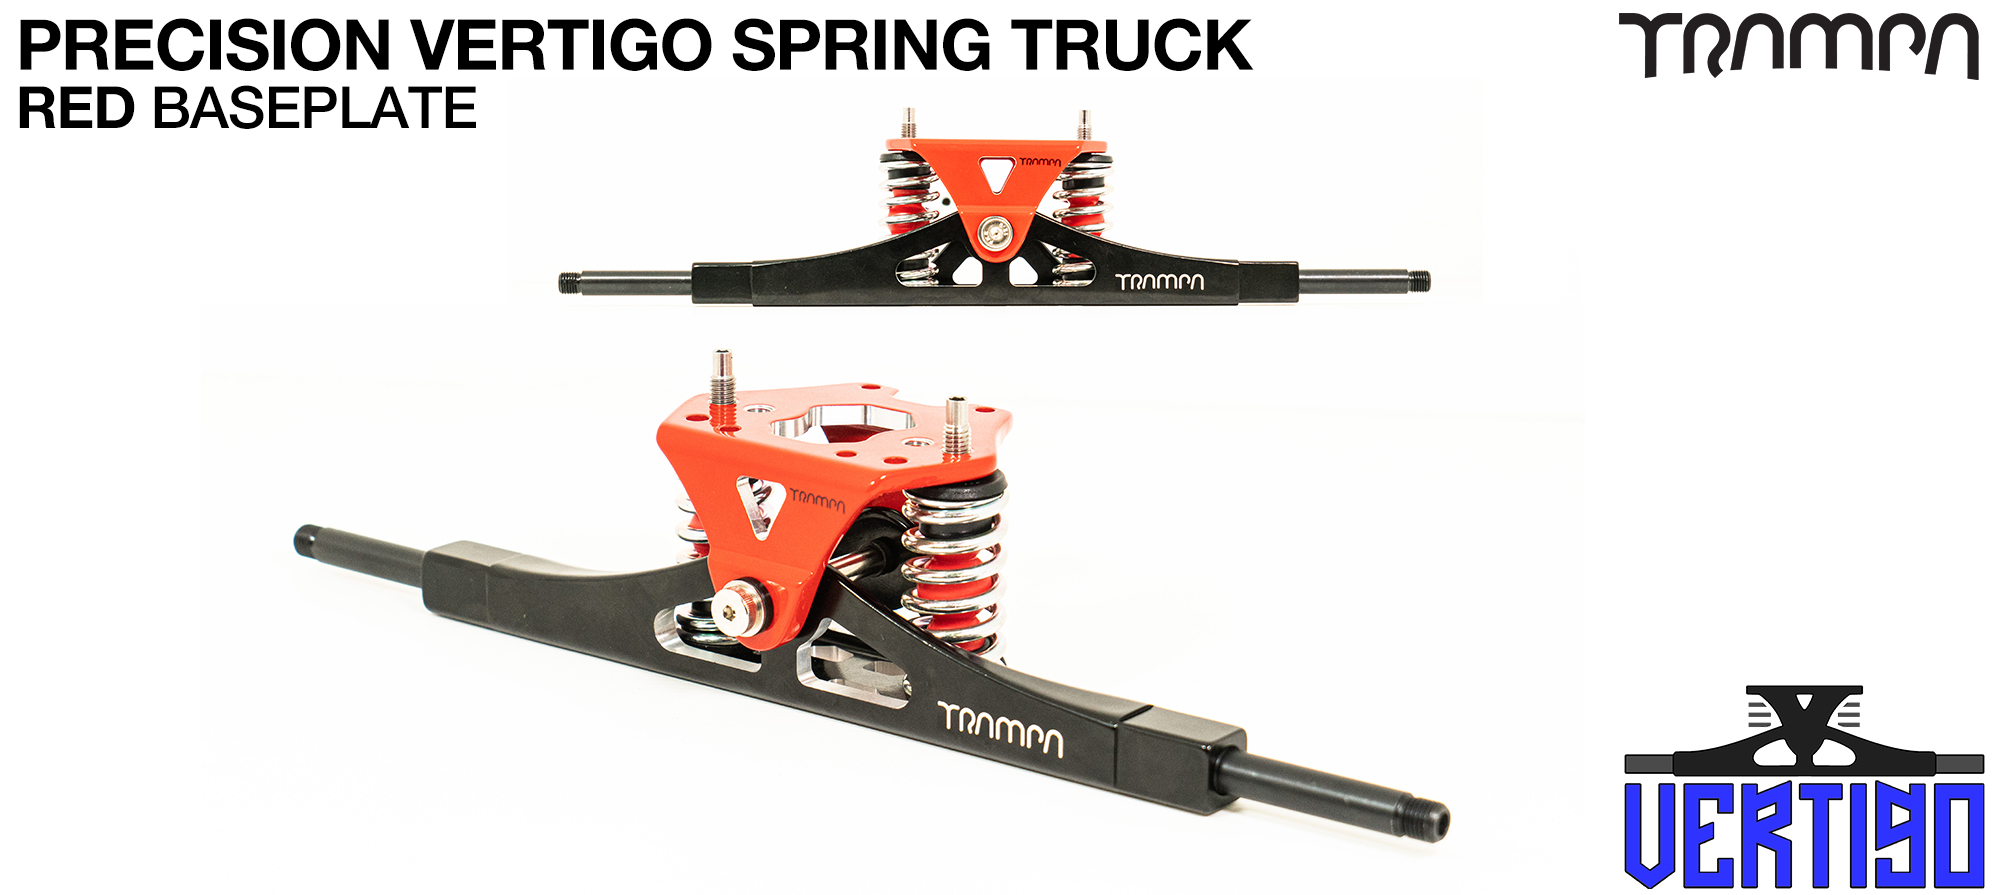 PRECISION CNC VERTIGO Truck RED - 12mm Hollow Axles with RED CNC baseplate & Steel Kingpin TRAMPA Spring Trucks